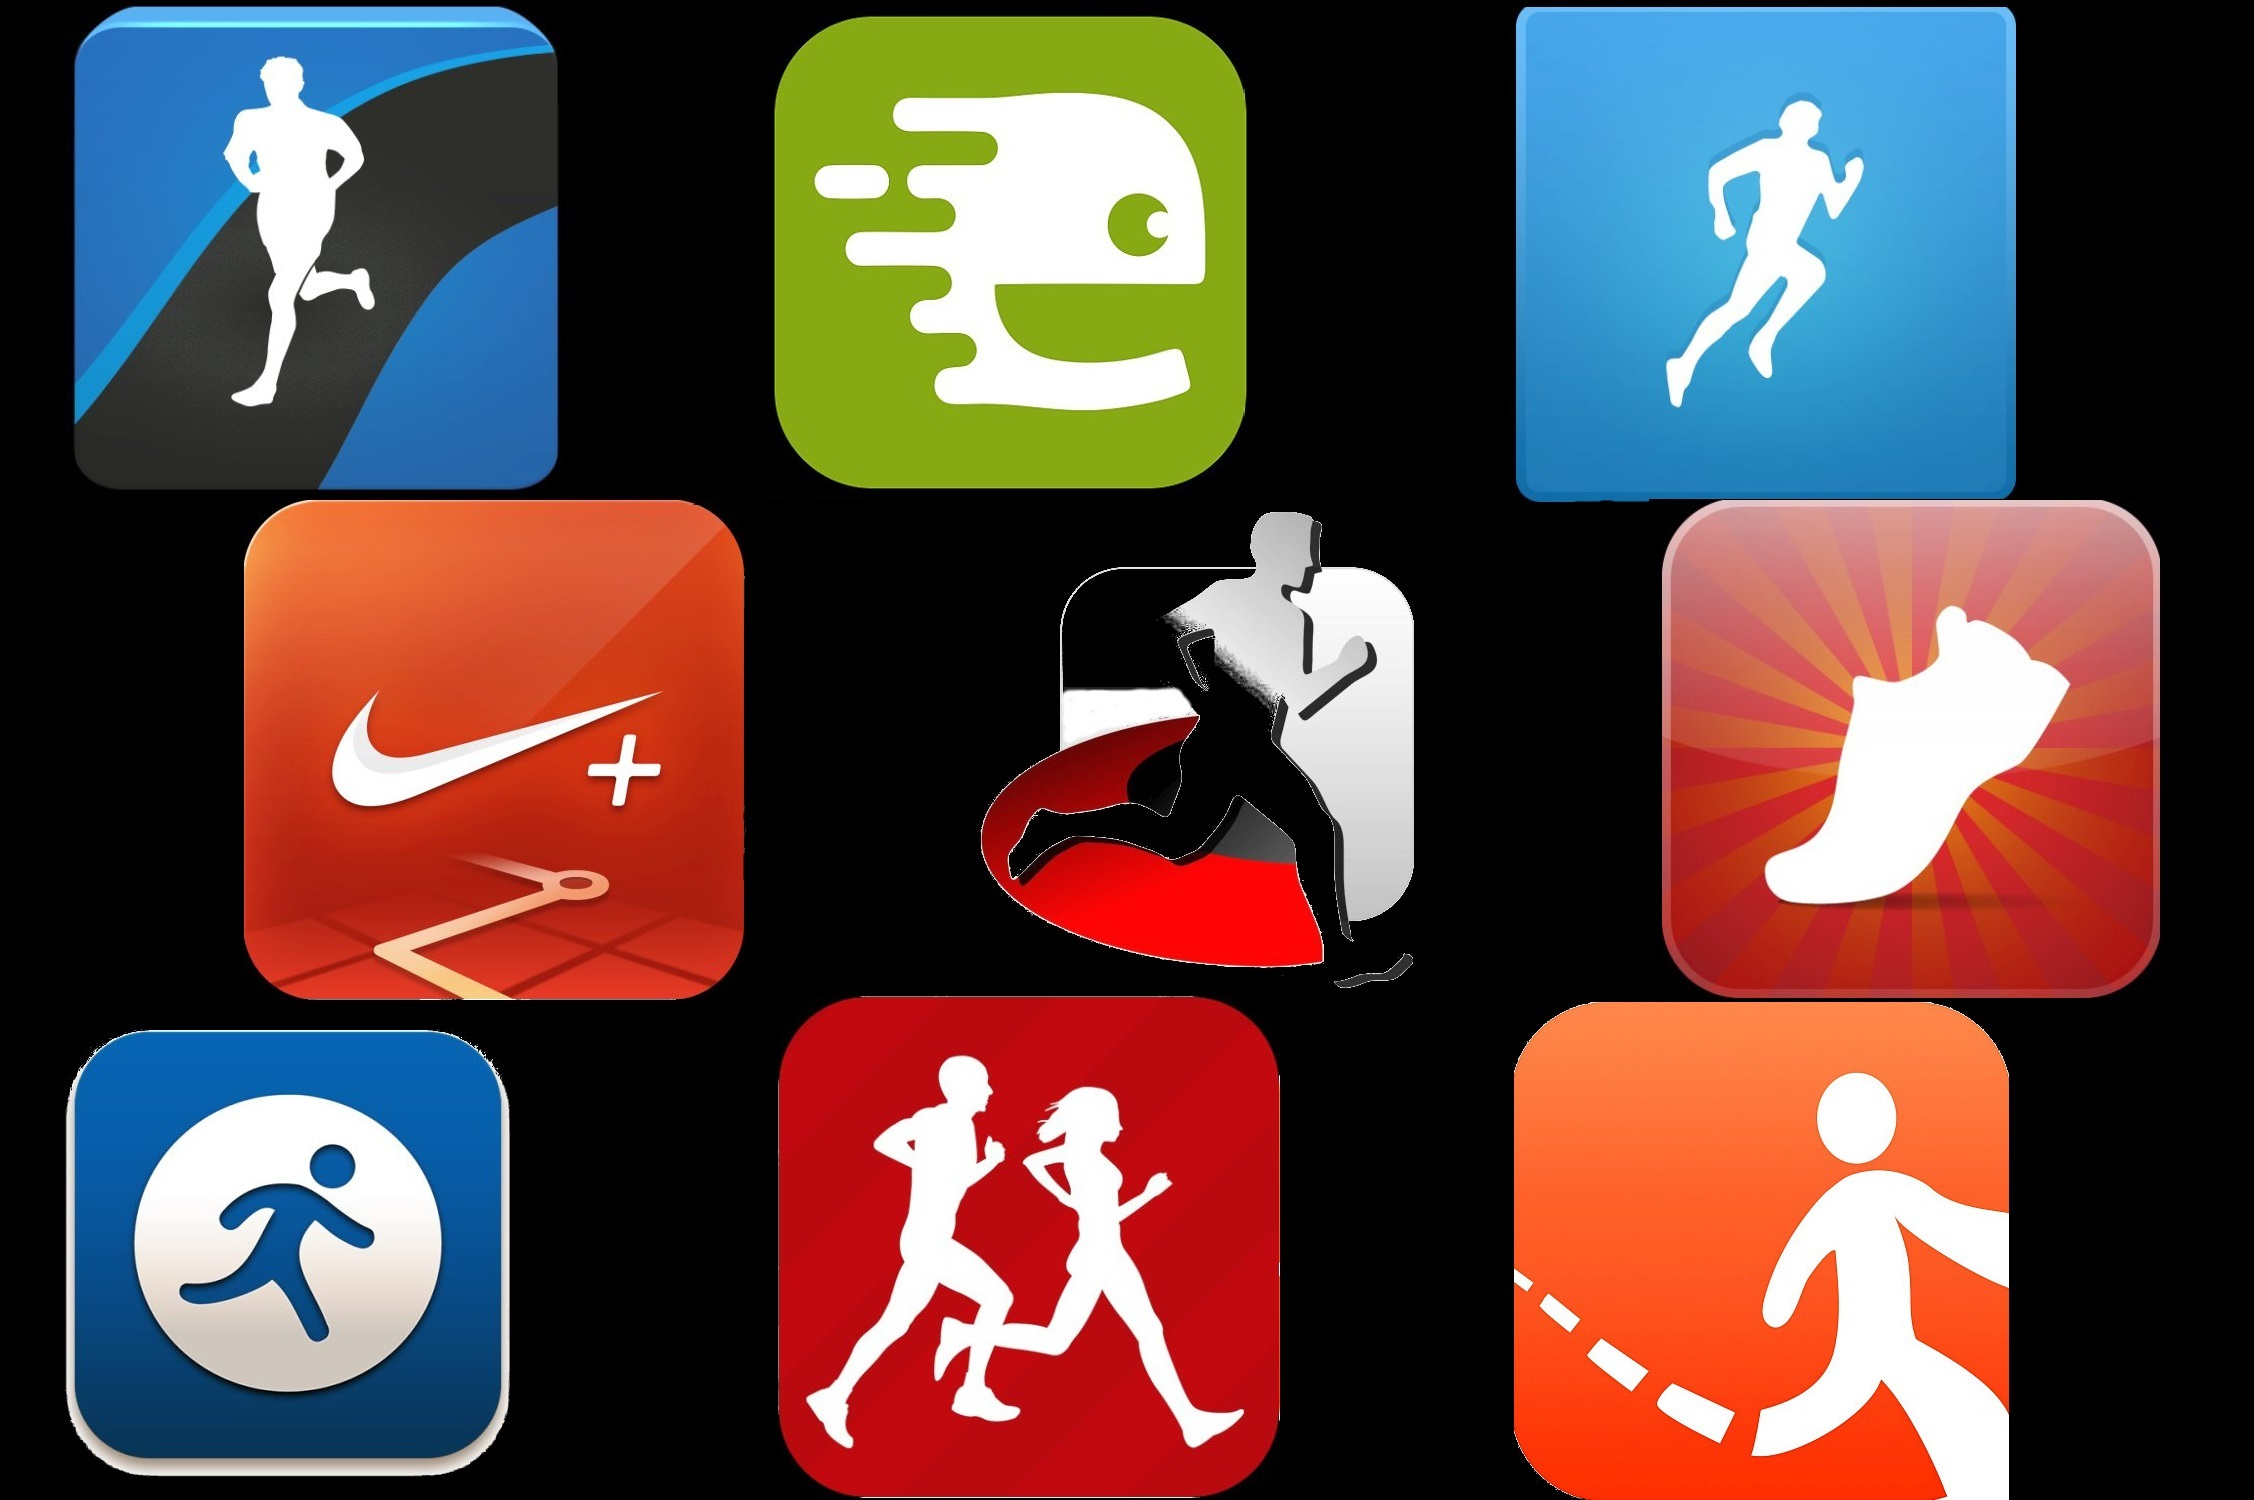 Sporttracker, Runtrainer, Runtastic, Runningroute, Runmeter, Runkeeper, Nike+, Mapmyrun, Endomondo